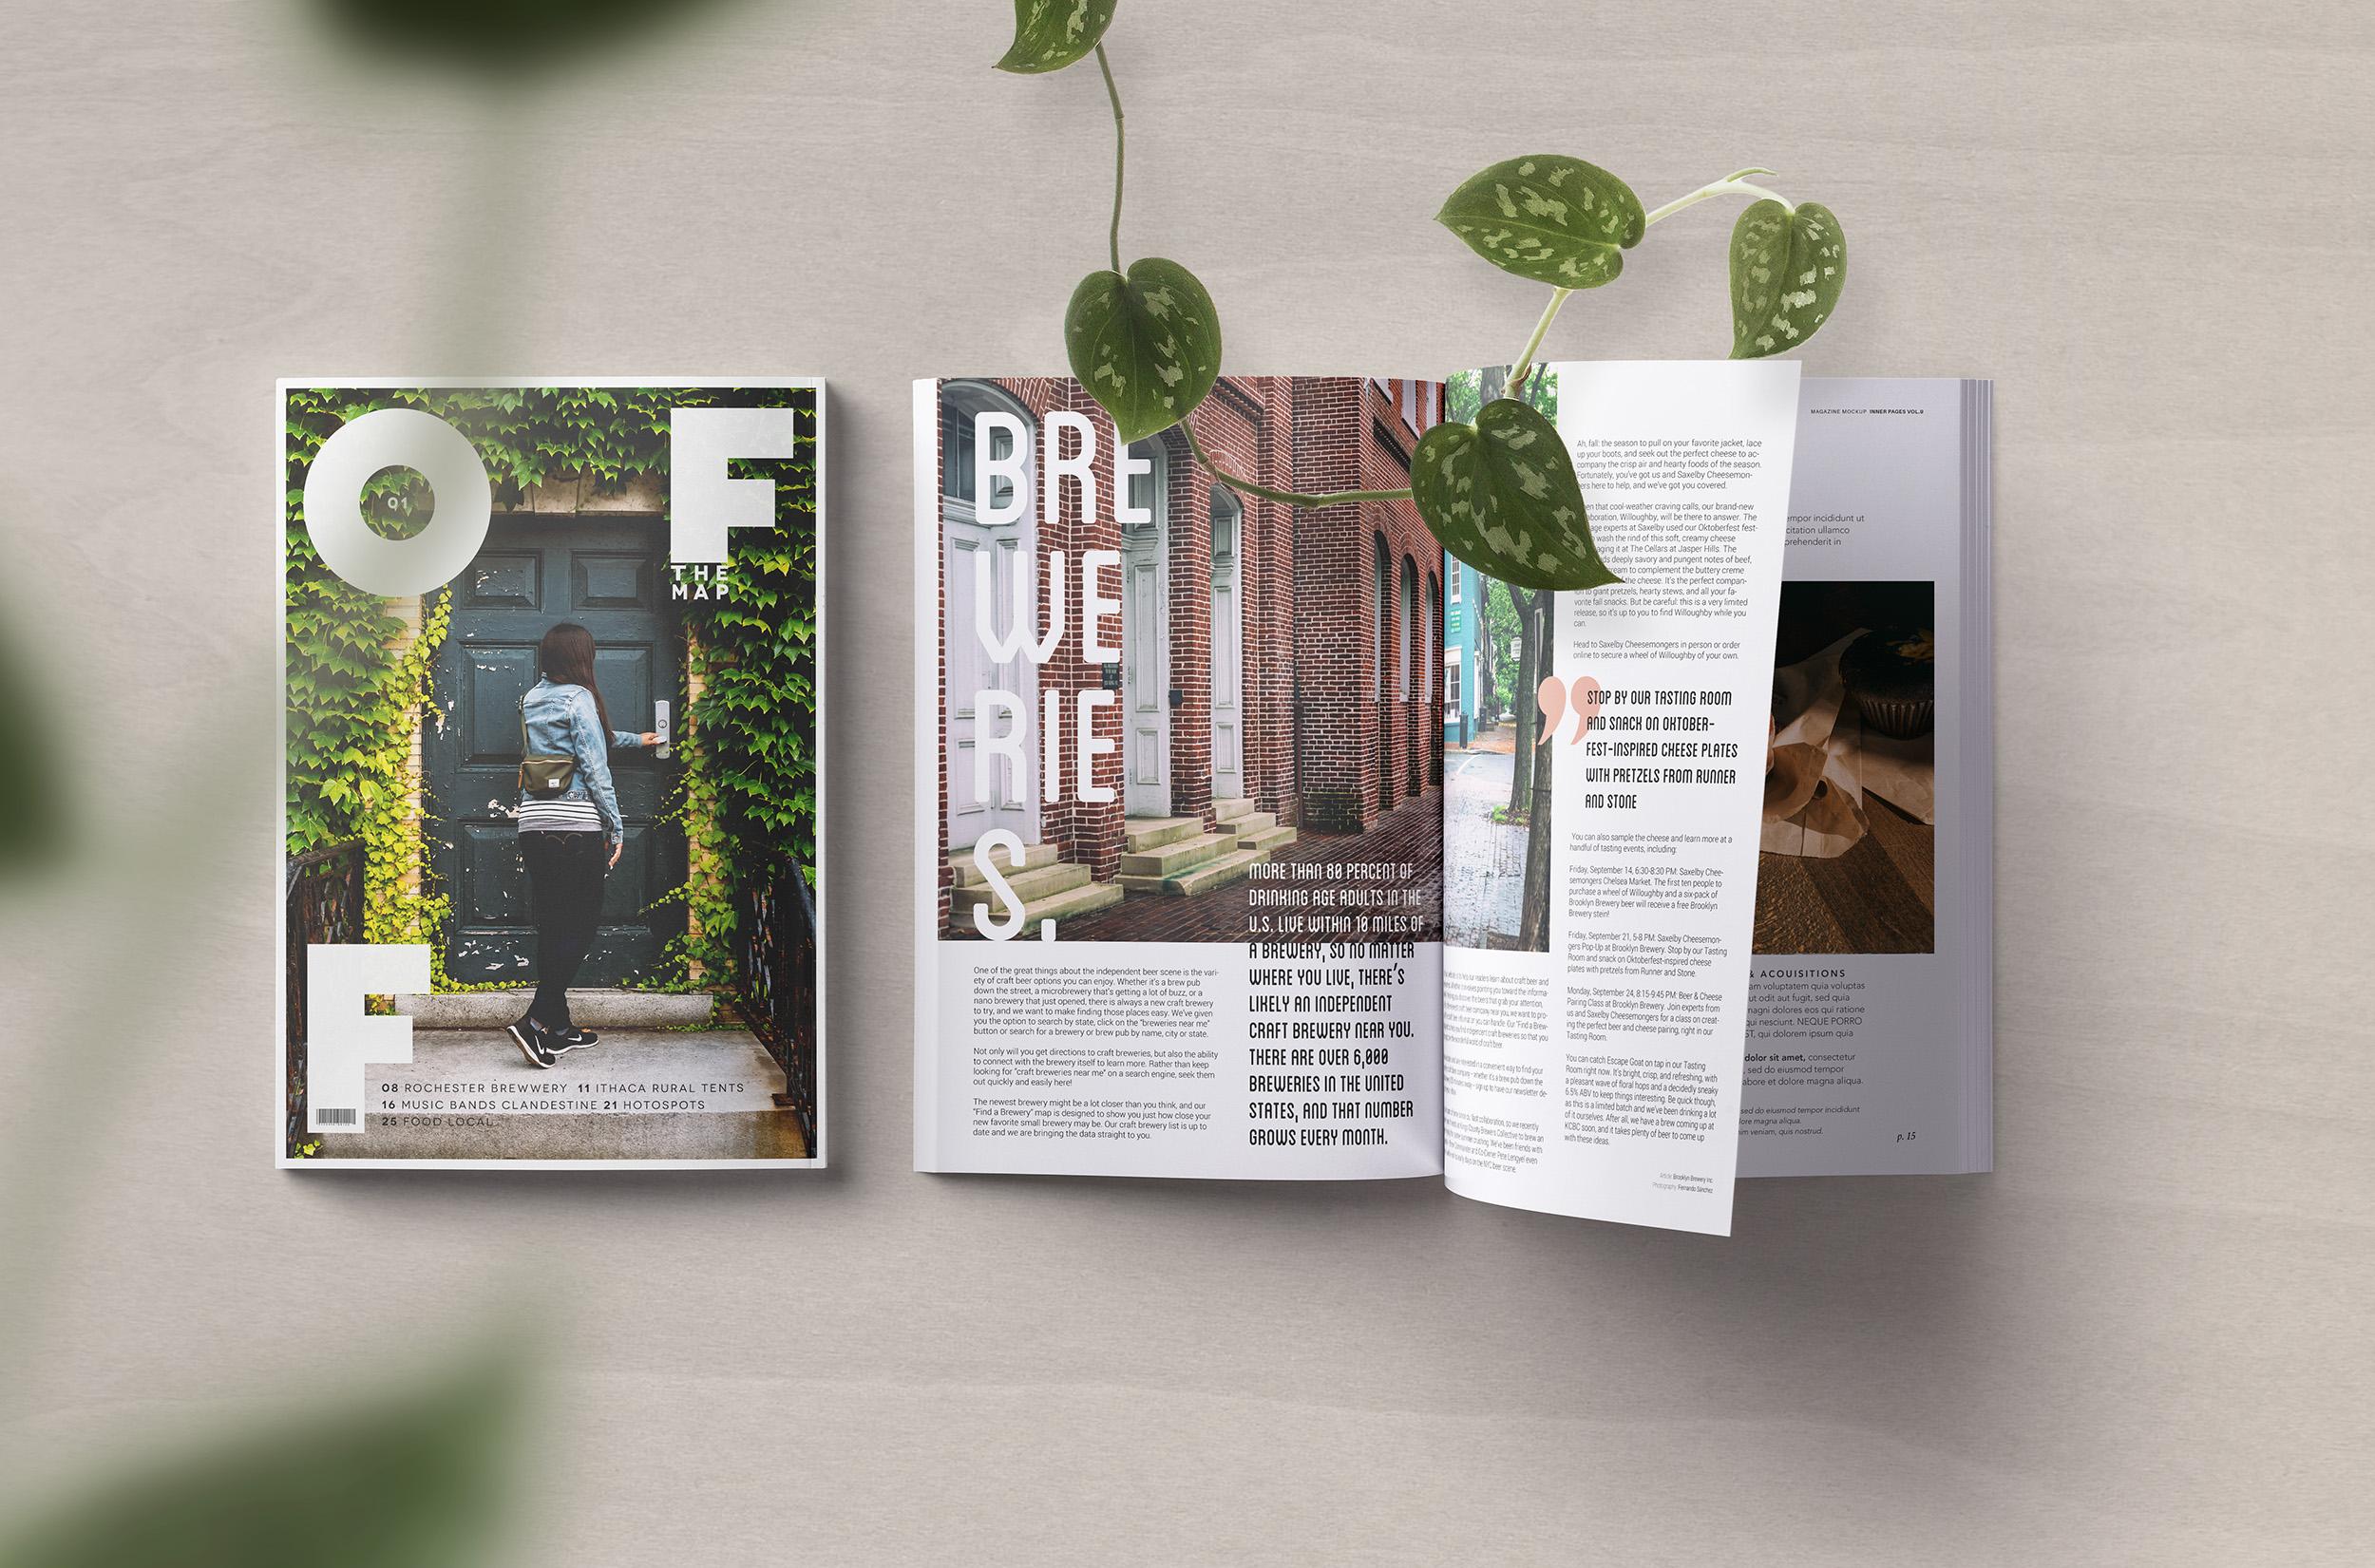 Editorial Photography and Design - Off the Map magazine - Conmisojos Fernando Sánchez Arribas